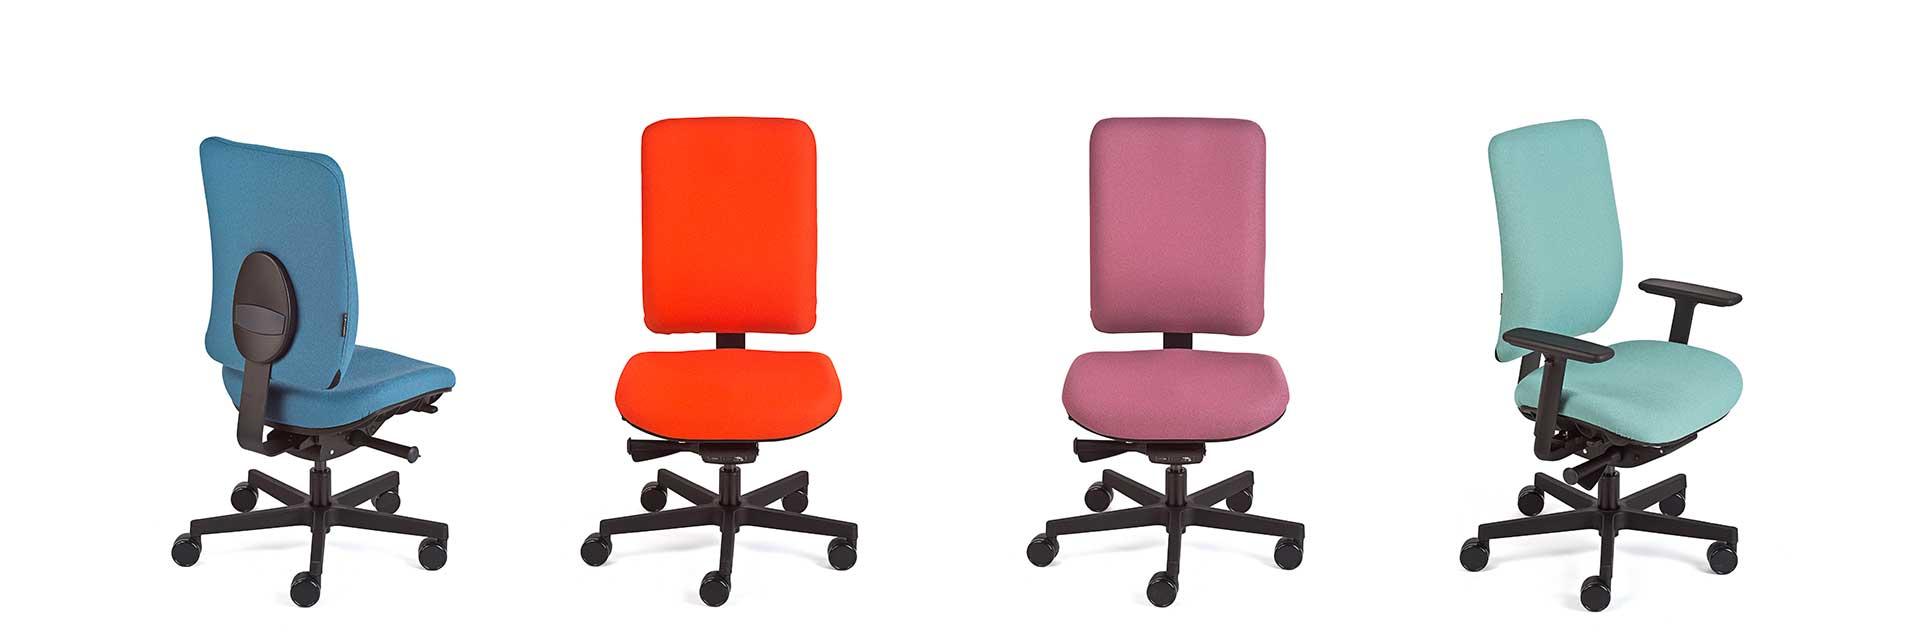 Farben-Vielfalt des Kinder-Bürodrehstuhls motion.junior